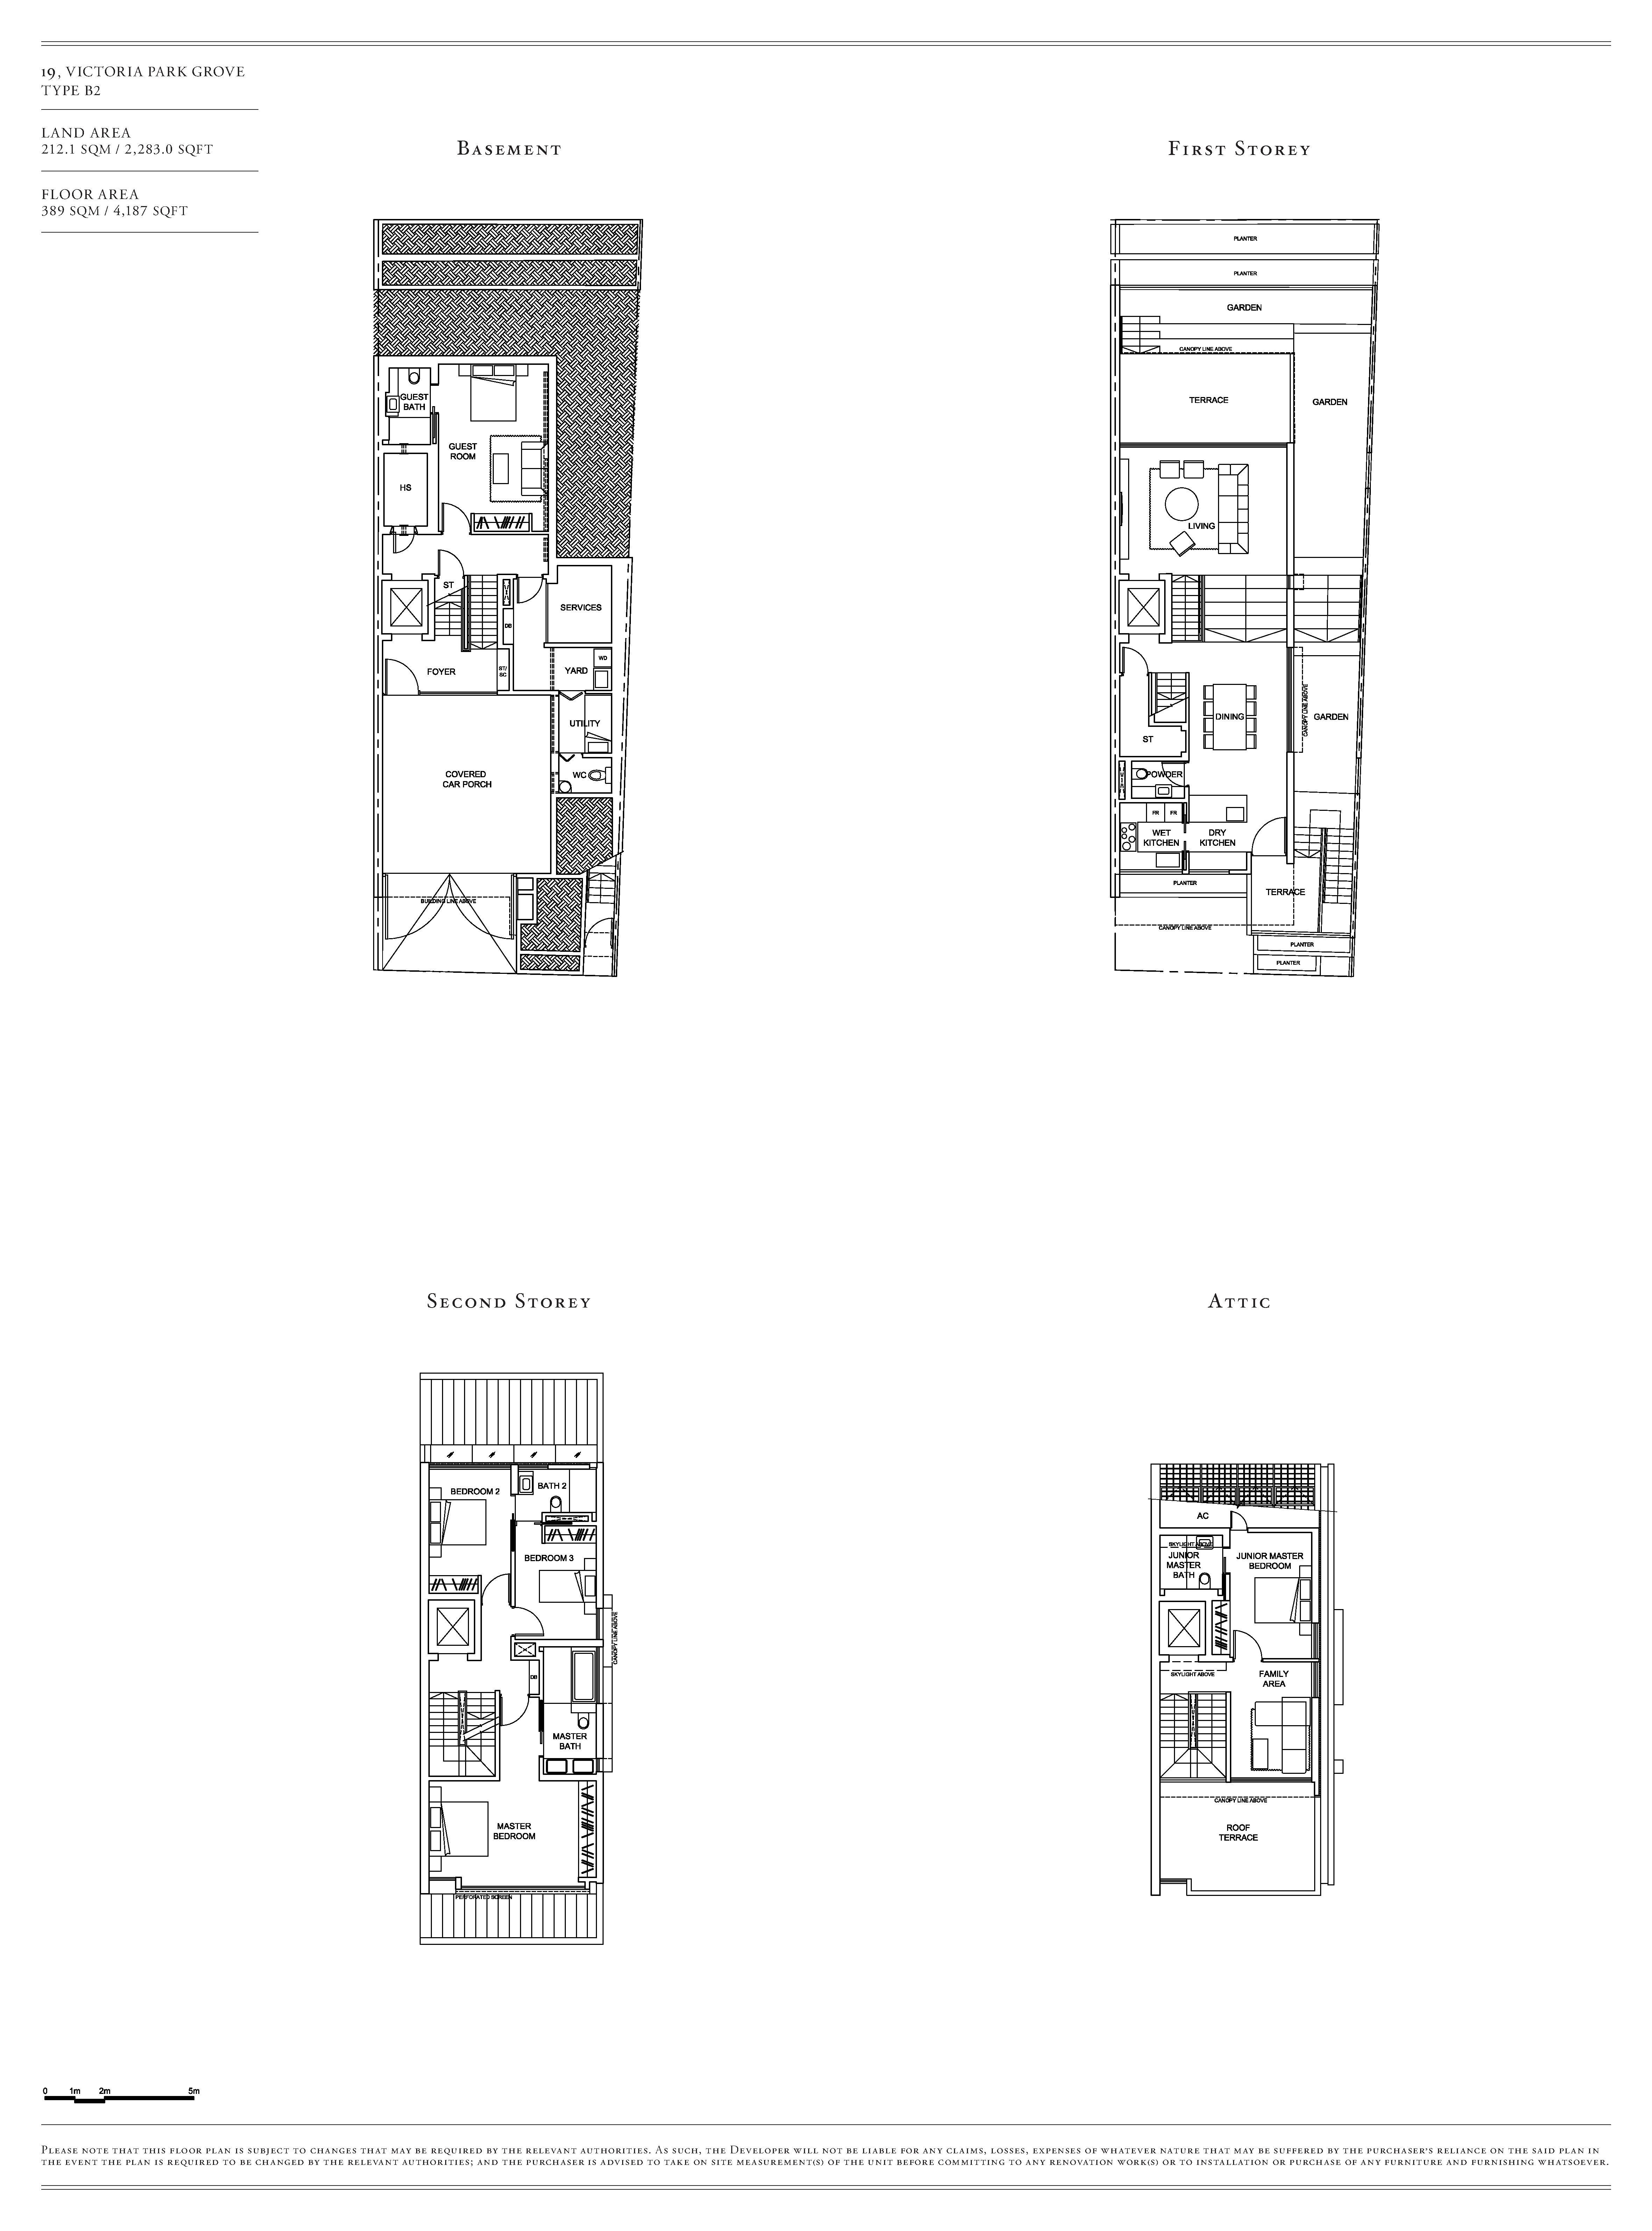 Victoria Park Villas House 19 Type B2 Floor Plans